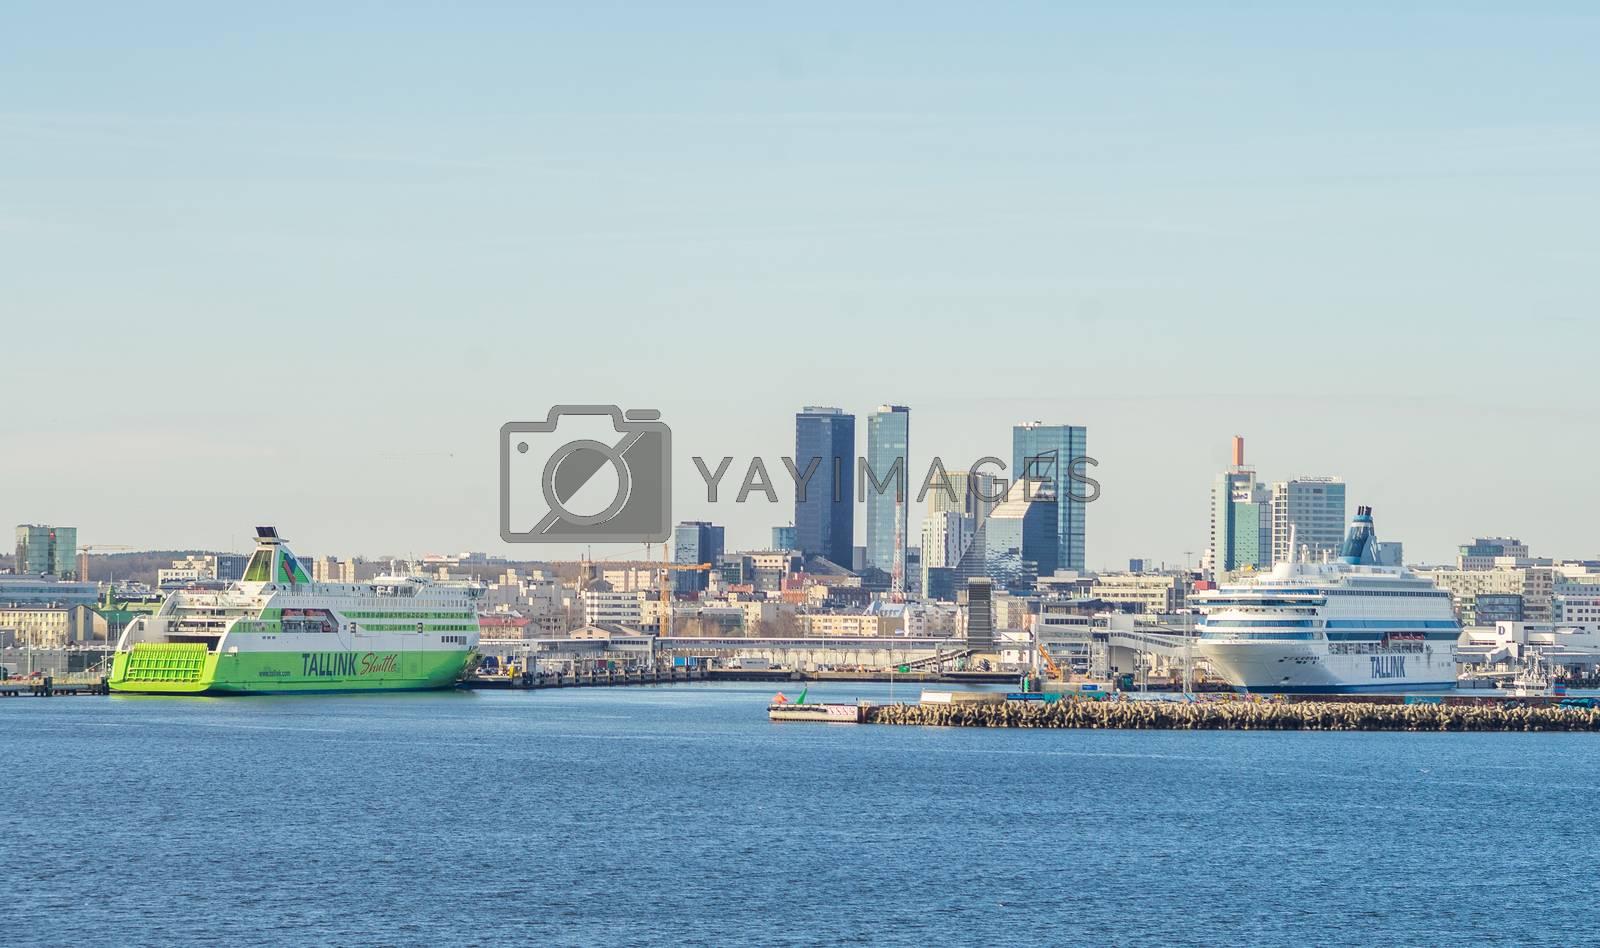 23 April 2019, Tallinn, Estonia. High-speed passenger and car ferrys of the Estonian shipping concern Tallink Silja Europa and Star in the port of Tallinn.